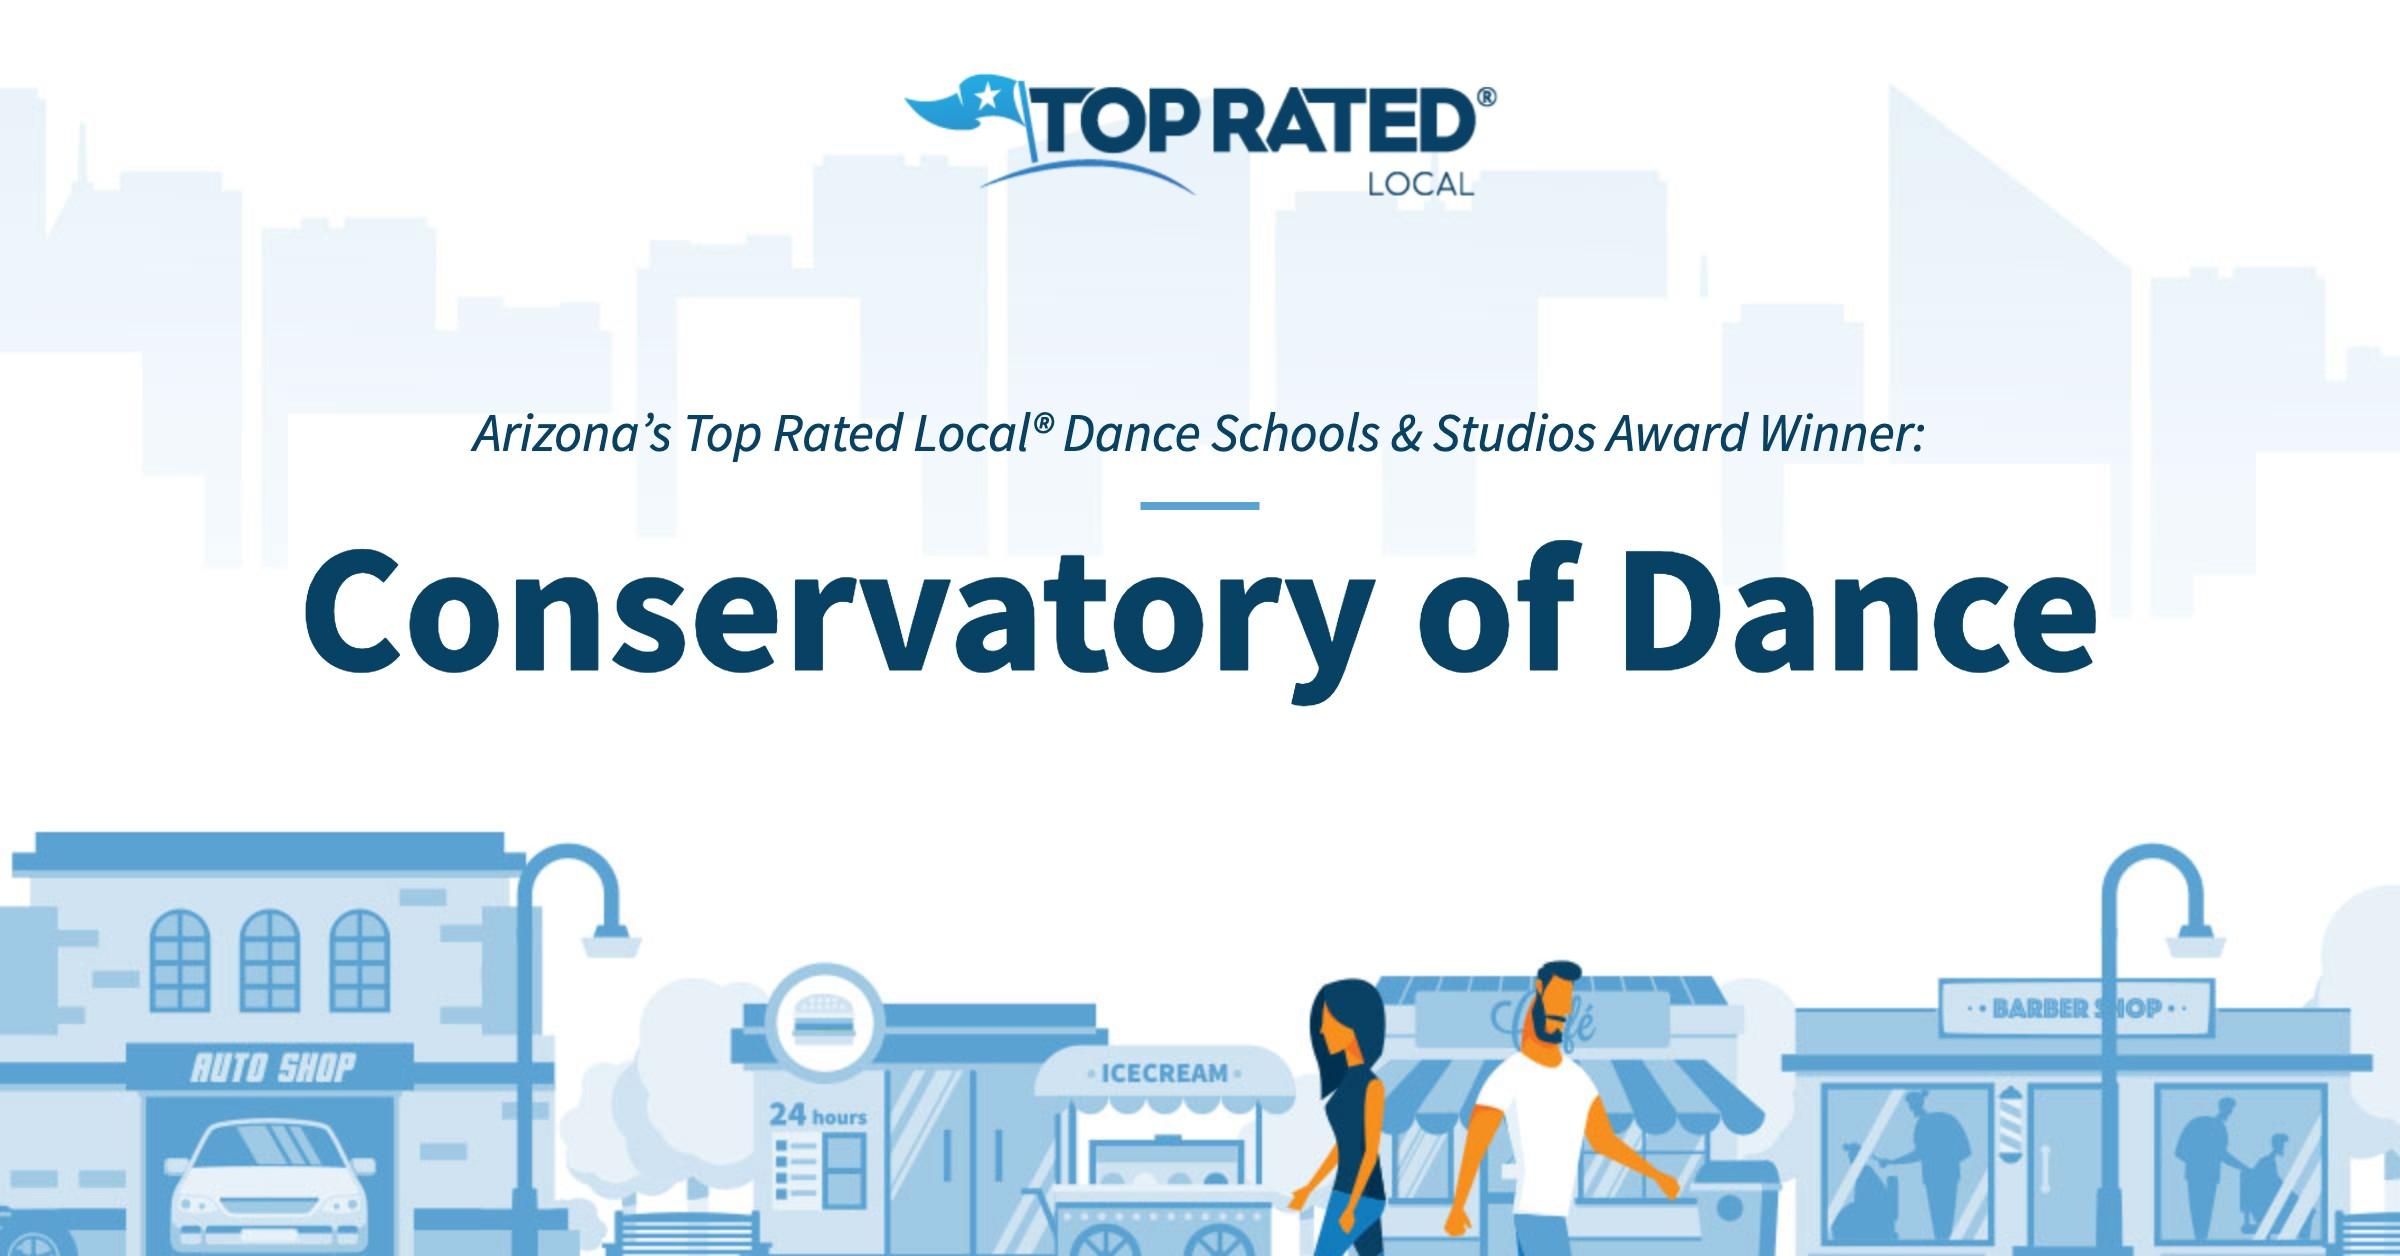 Arizona's Top Rated Local® Dance Schools & Studios Award Winner: Conservatory of Dance